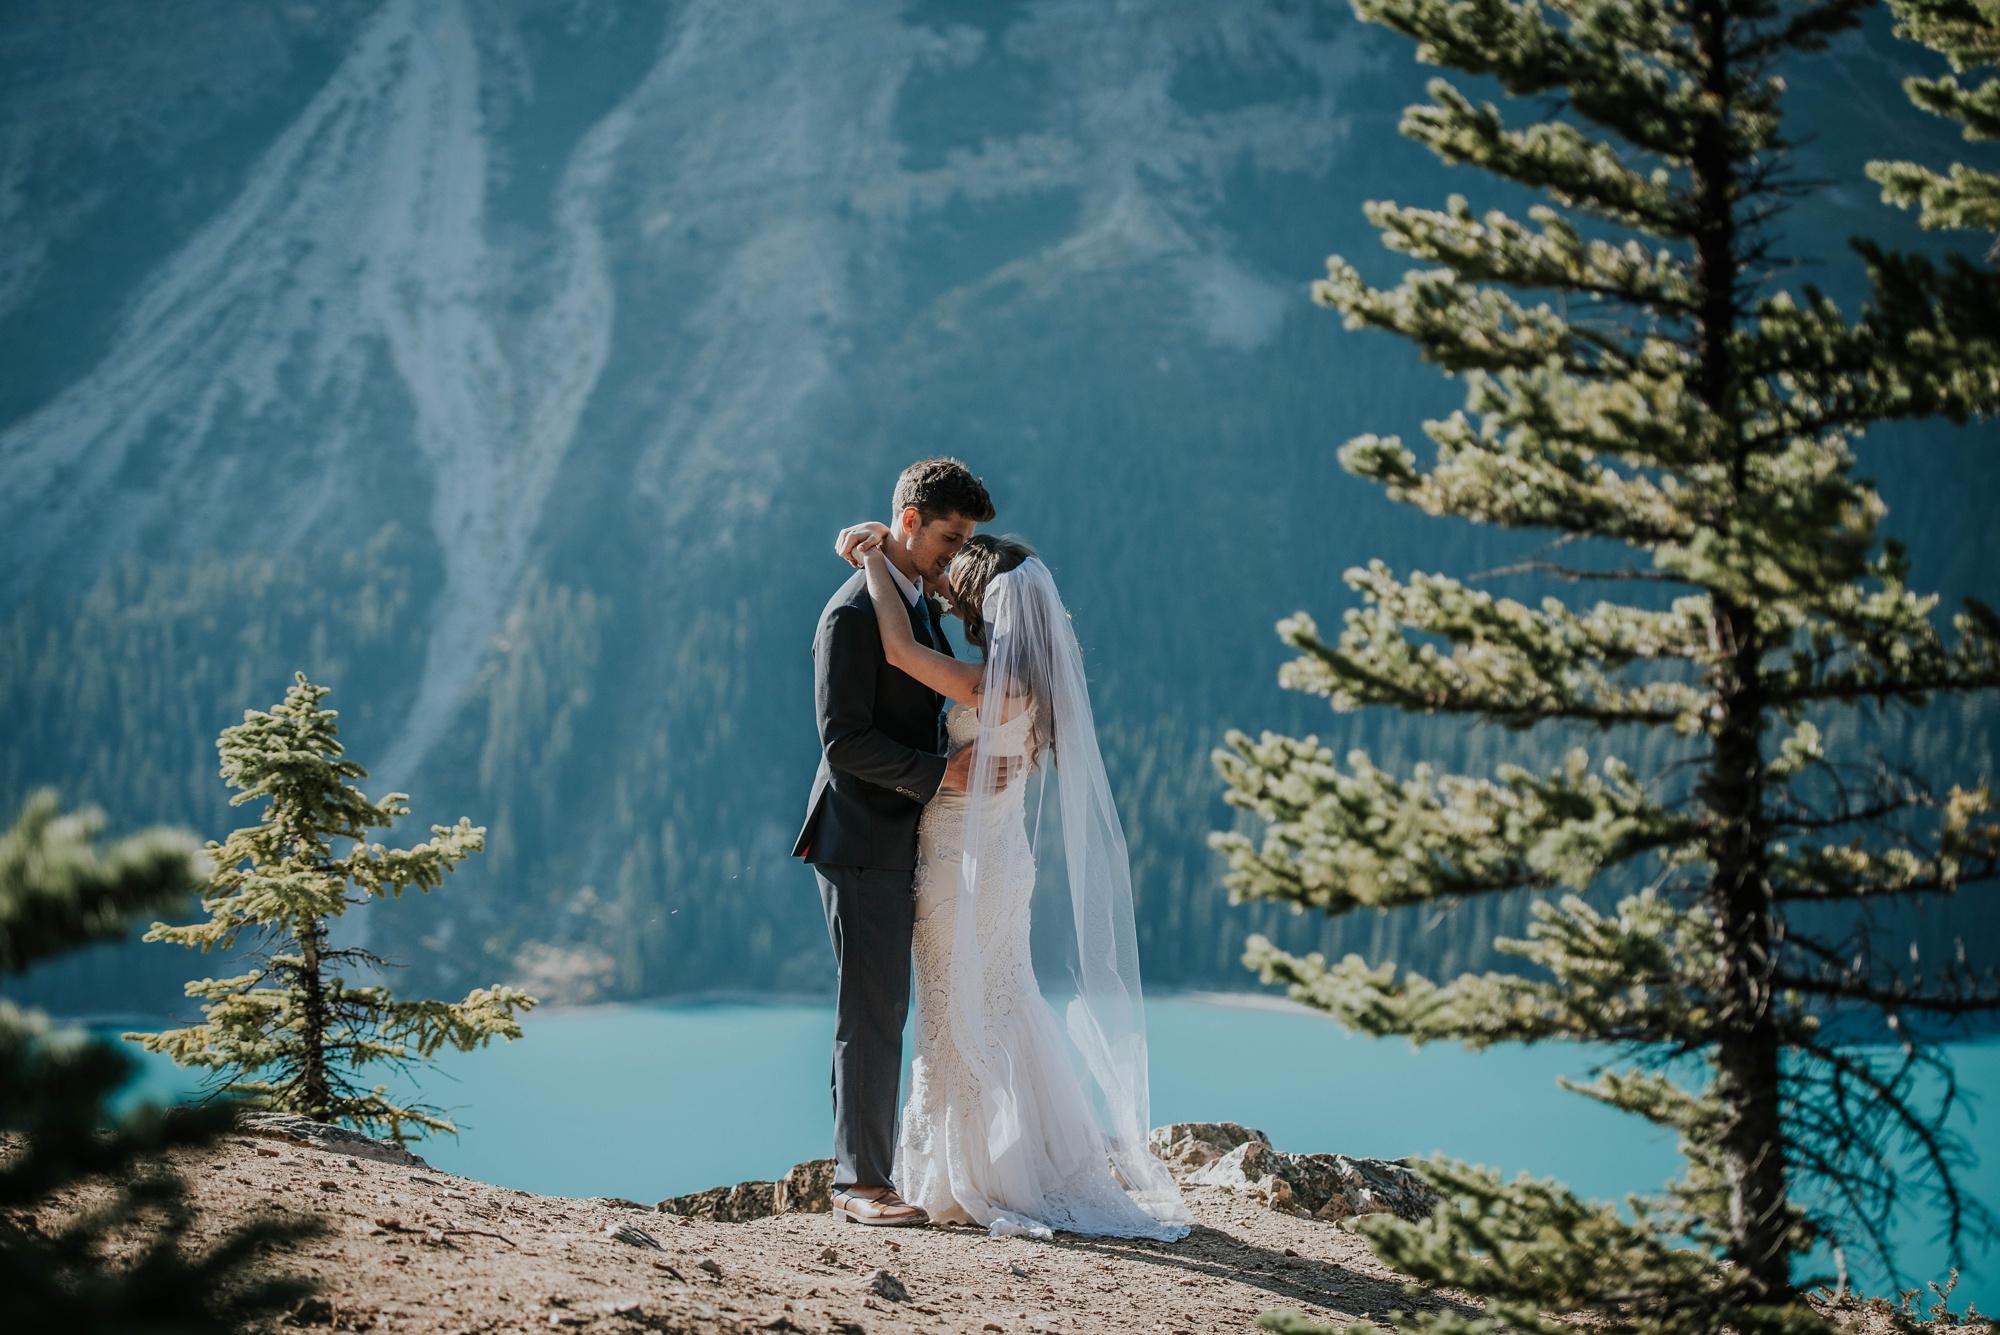 bride and groom embrace and kiss during bridal portraits at Peyto Lake